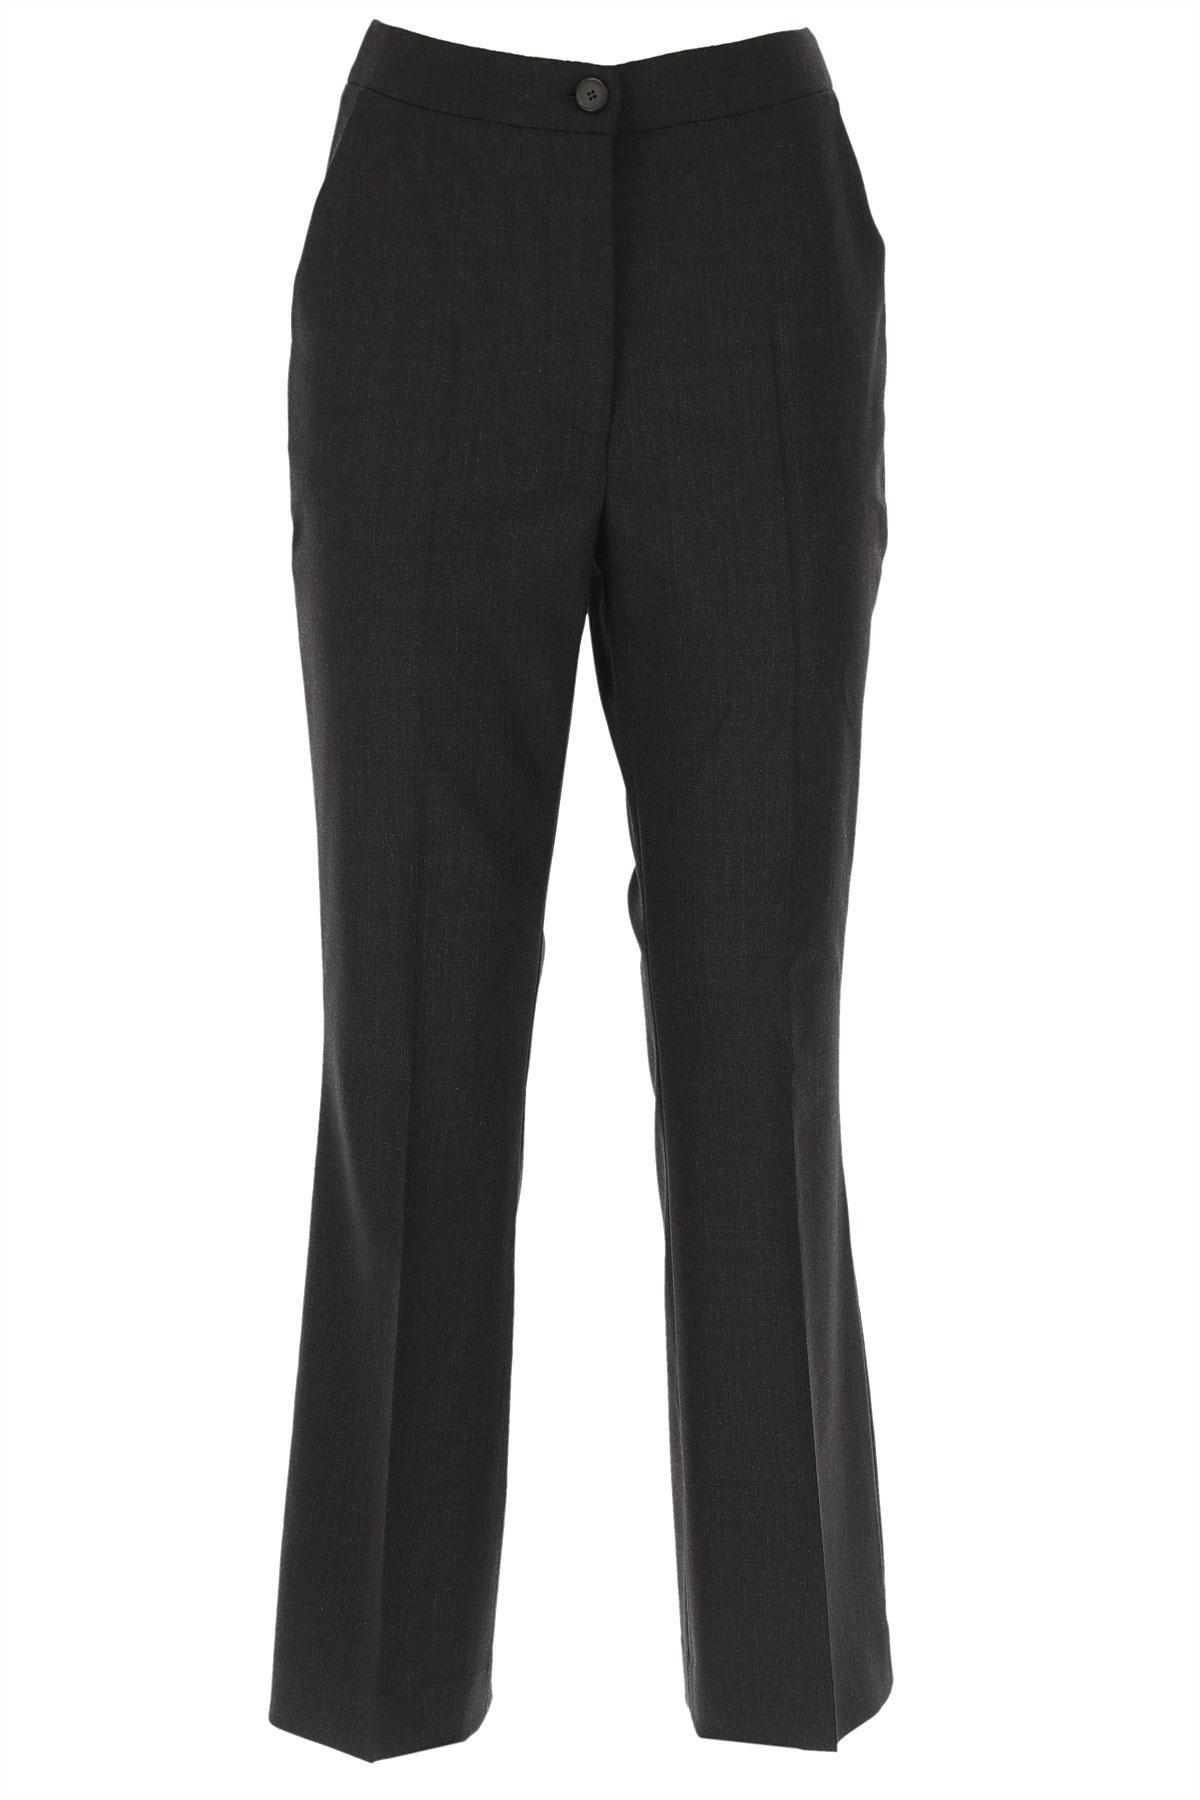 Giada Benincasa Pants for Women On Sale, Anthracite Grey, Virgin wool, 2019, 26